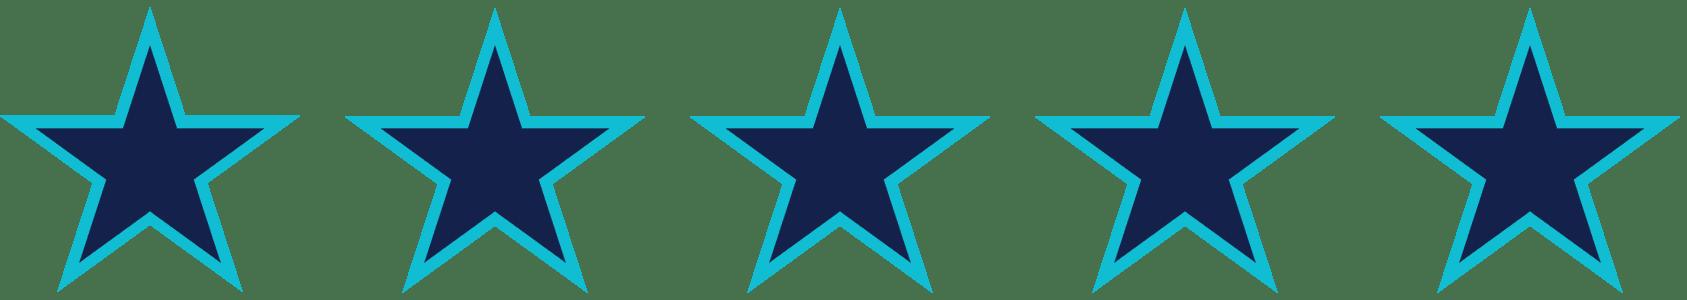 bcm-5-stars-blue